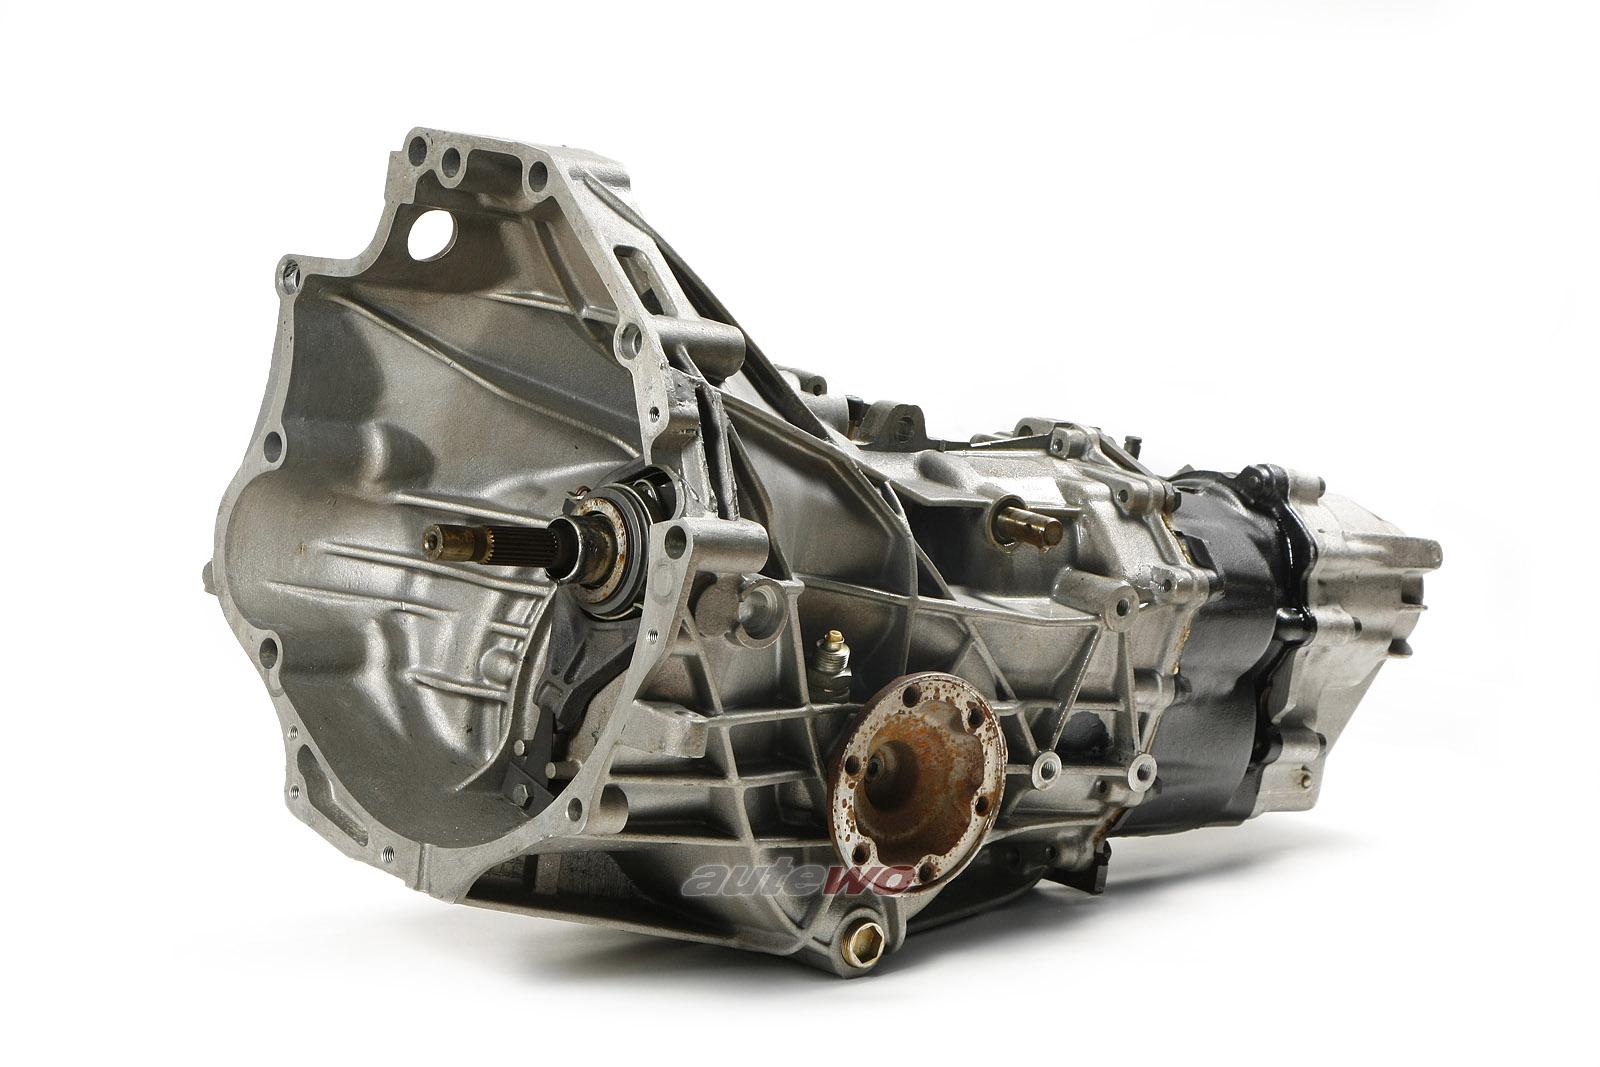 016300047P NEU Audi 100 Typ 44 2.0-2.2l 5-Gang-Getriebe AEY 24010